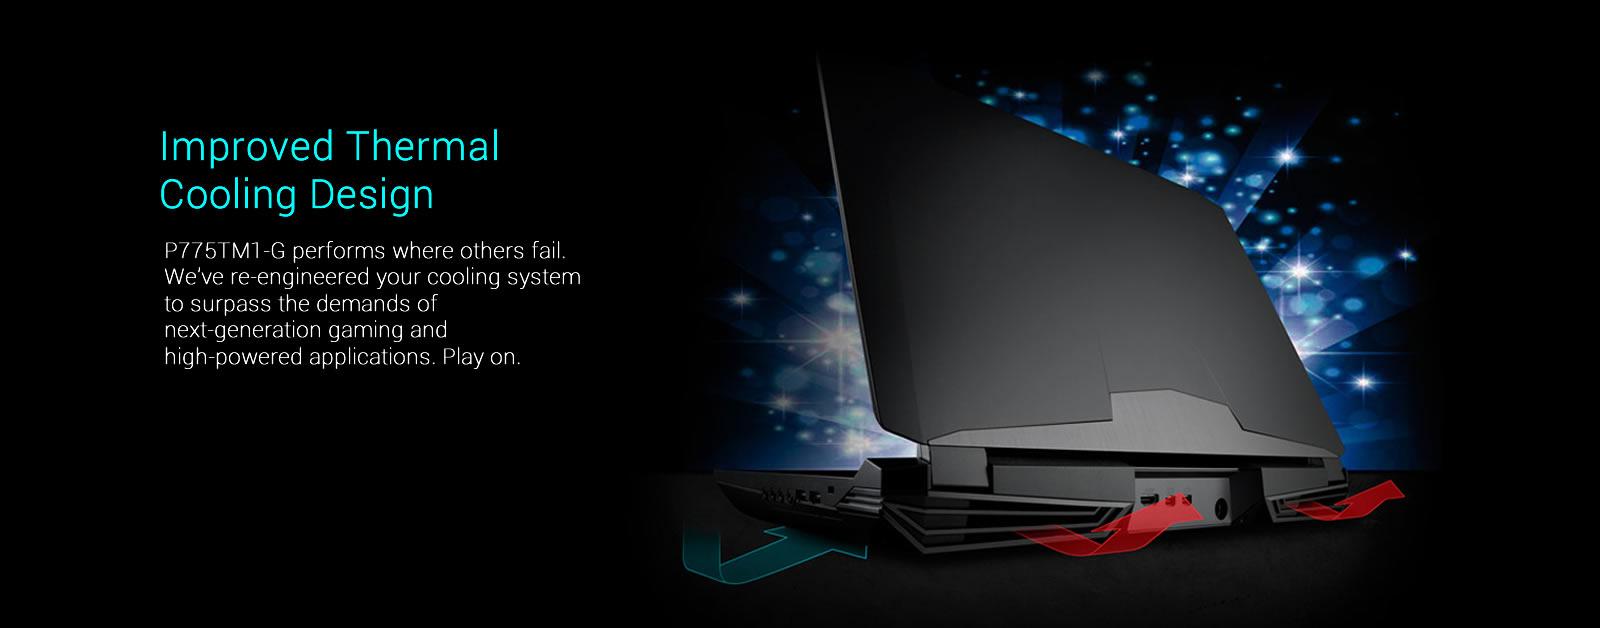 Quick Ship Clevo P775TM1-G2 (Sager NP9176-G2) Gaming Laptop